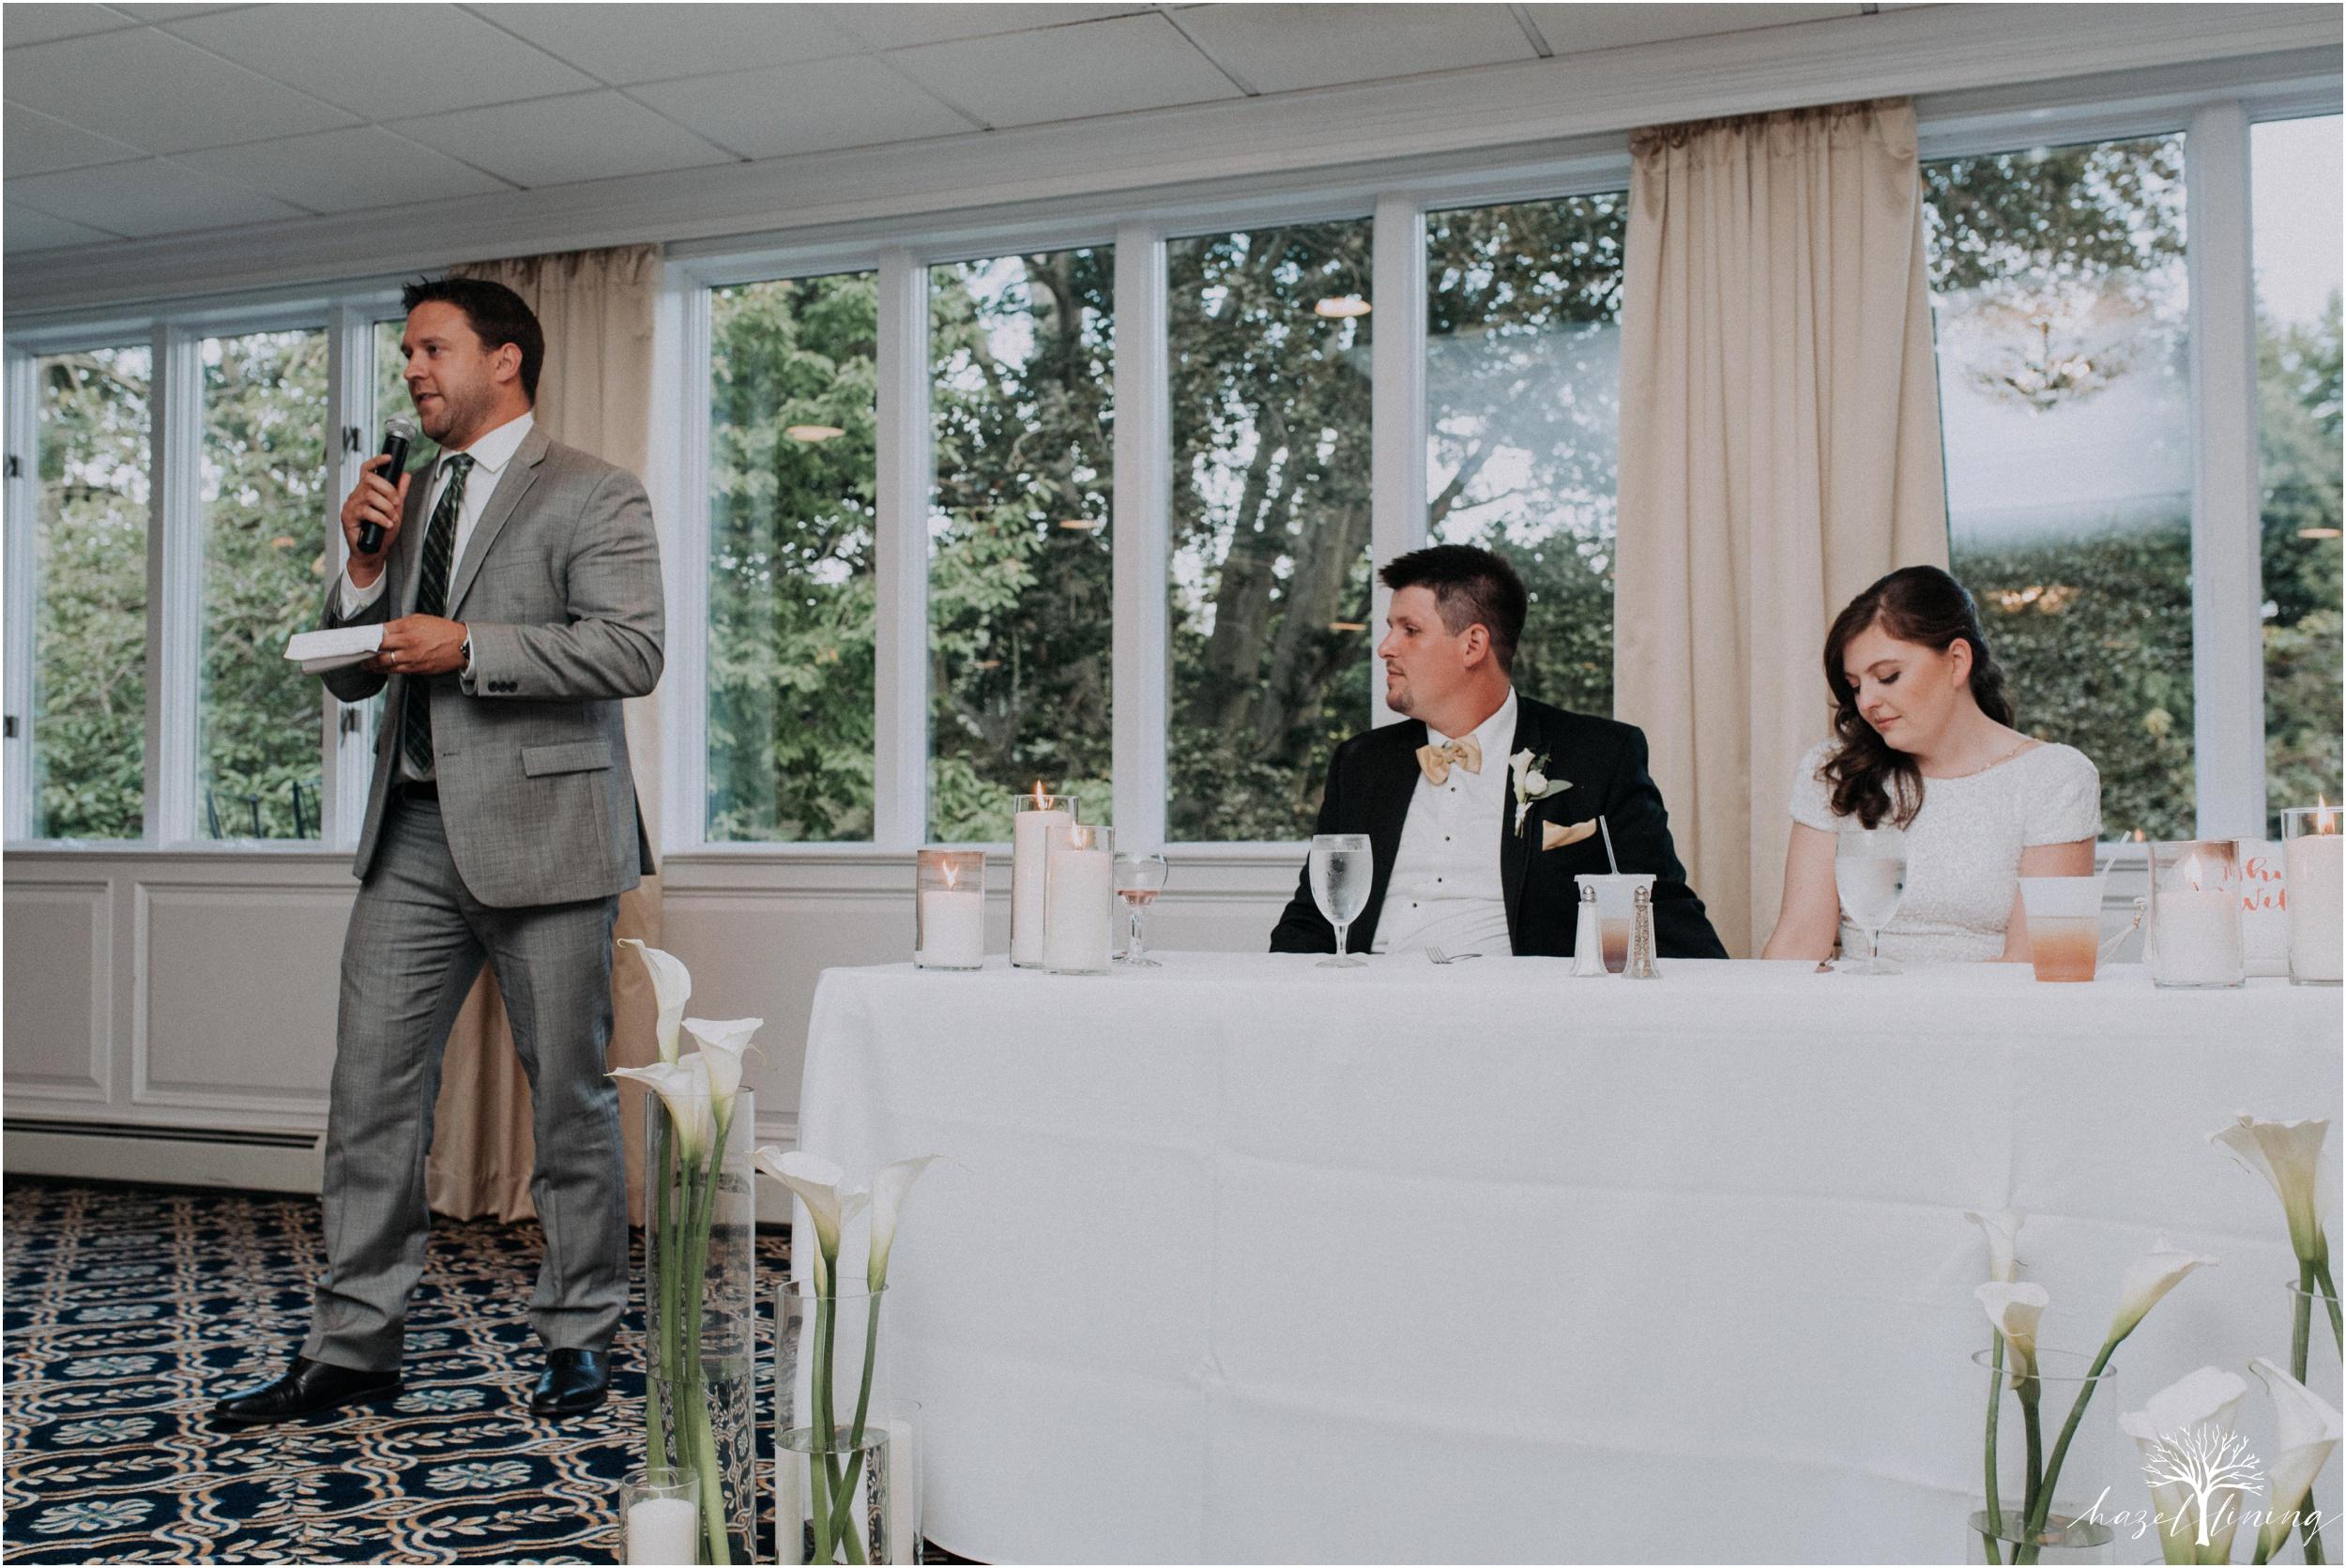 elizabeth-doelp-andrew-foreback-middletown-country-club-summer-langhorne-pennsylvania-wedding-hazel-lining-travel-wedding-elopement-photography_0143.jpg